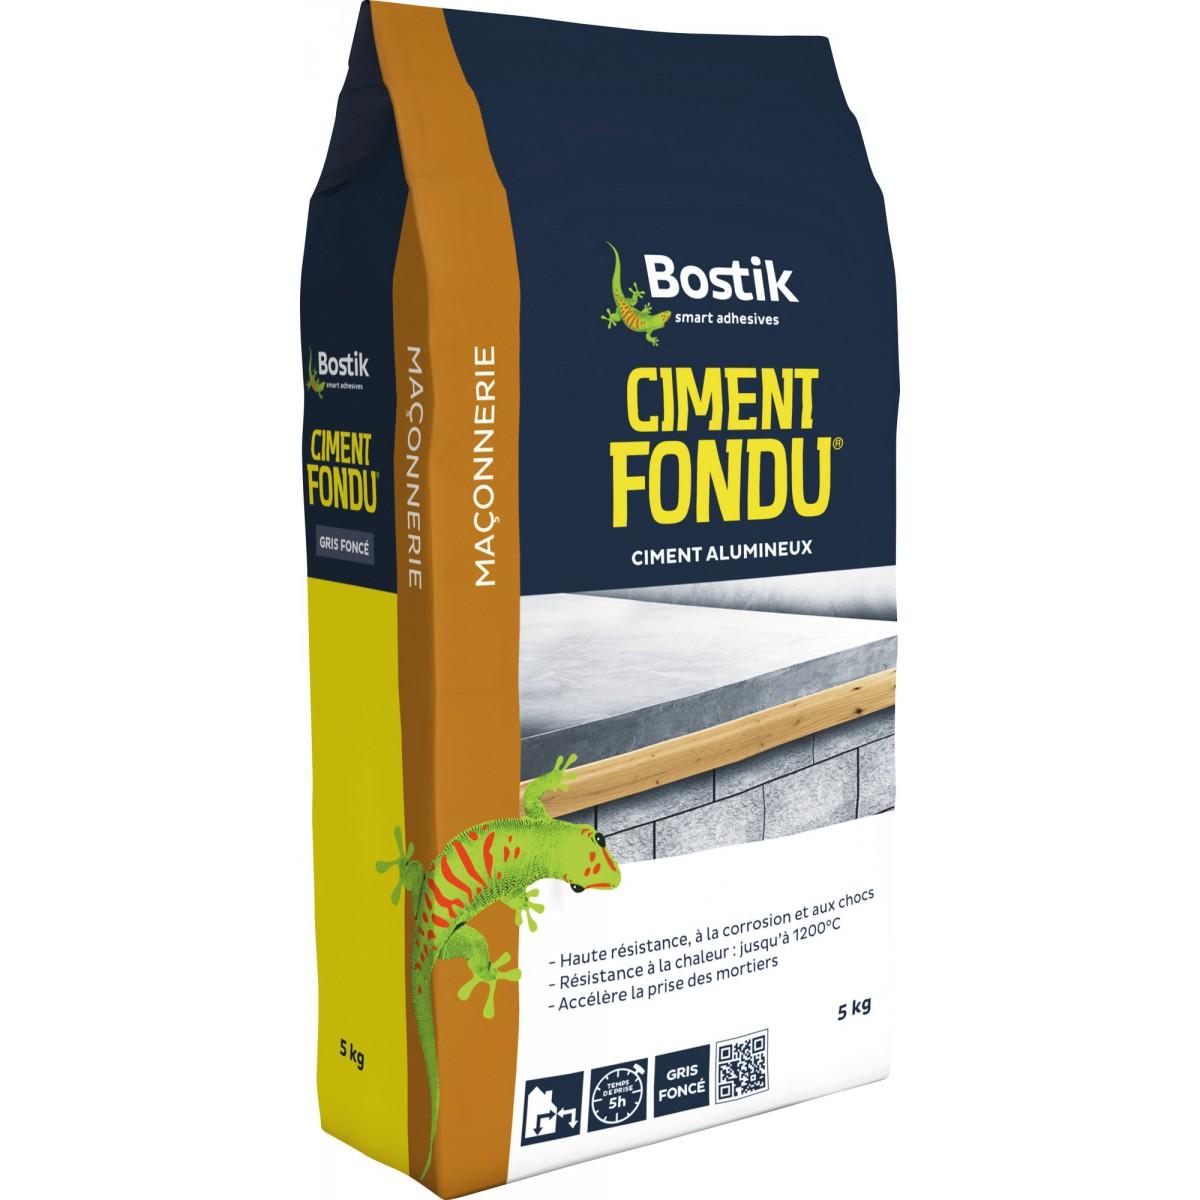 Ciment fondu Bostik - Sac 5 Kg